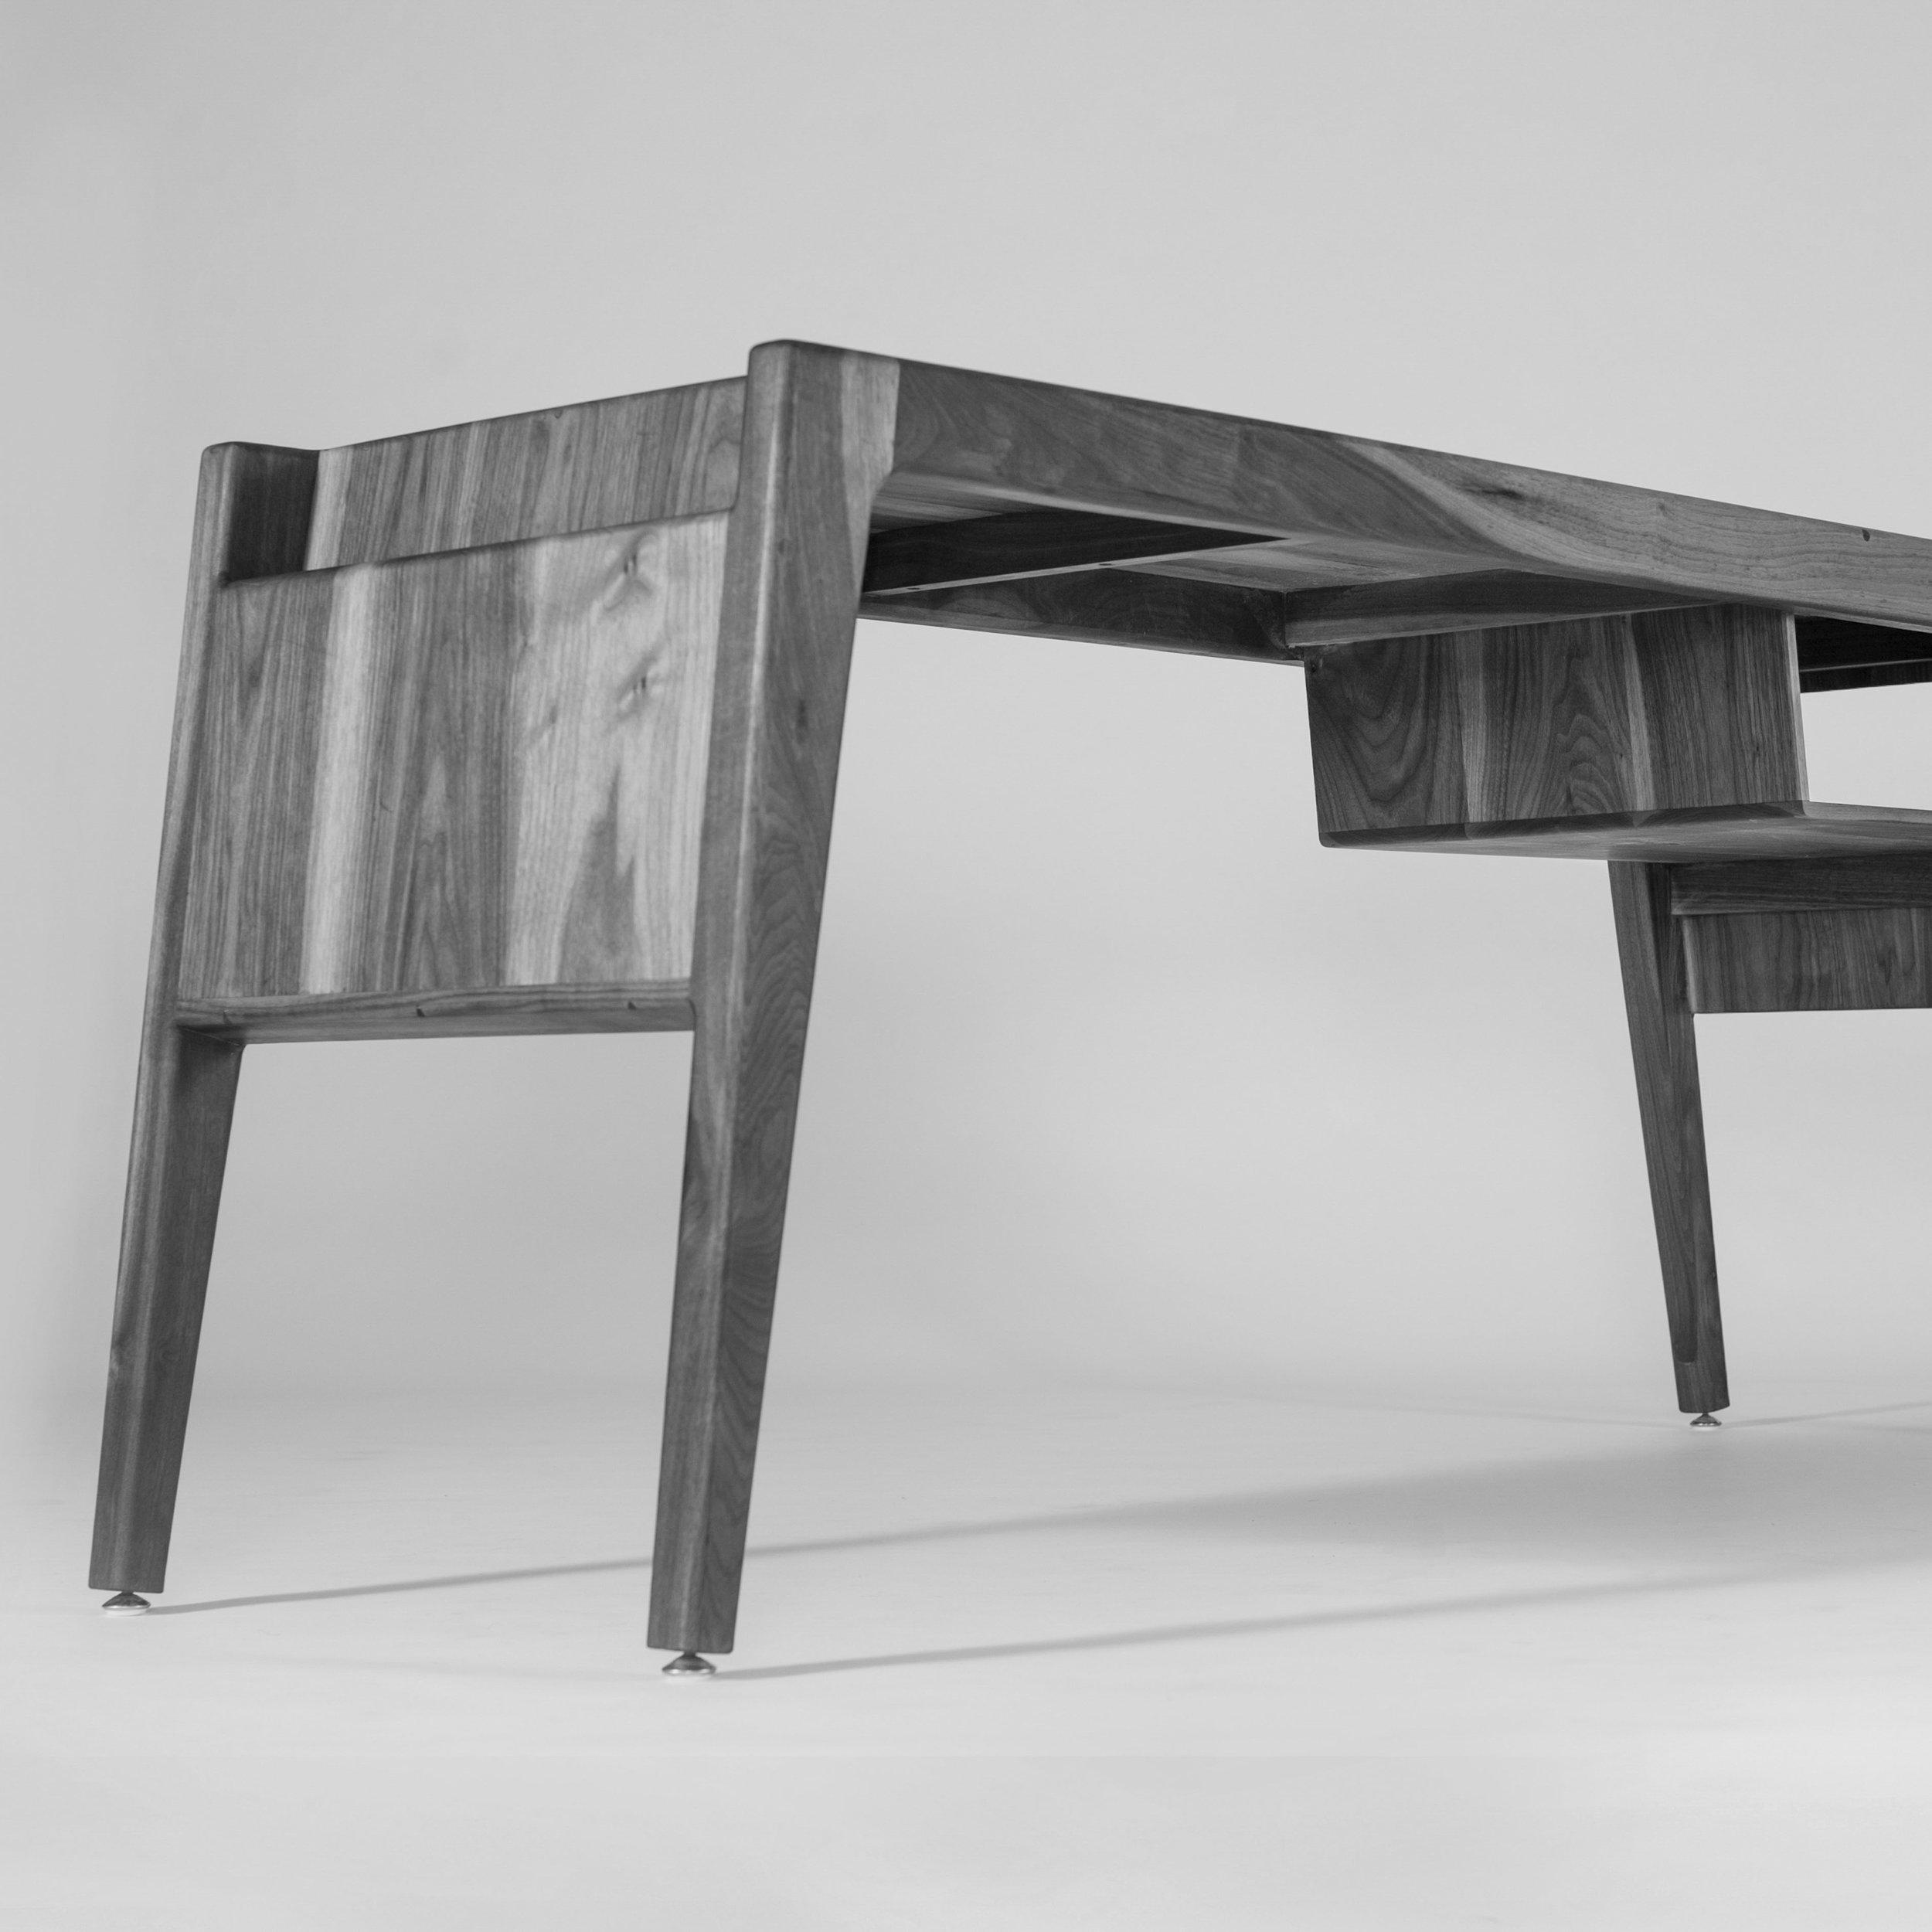 ali sandifer, handcrafted furniture